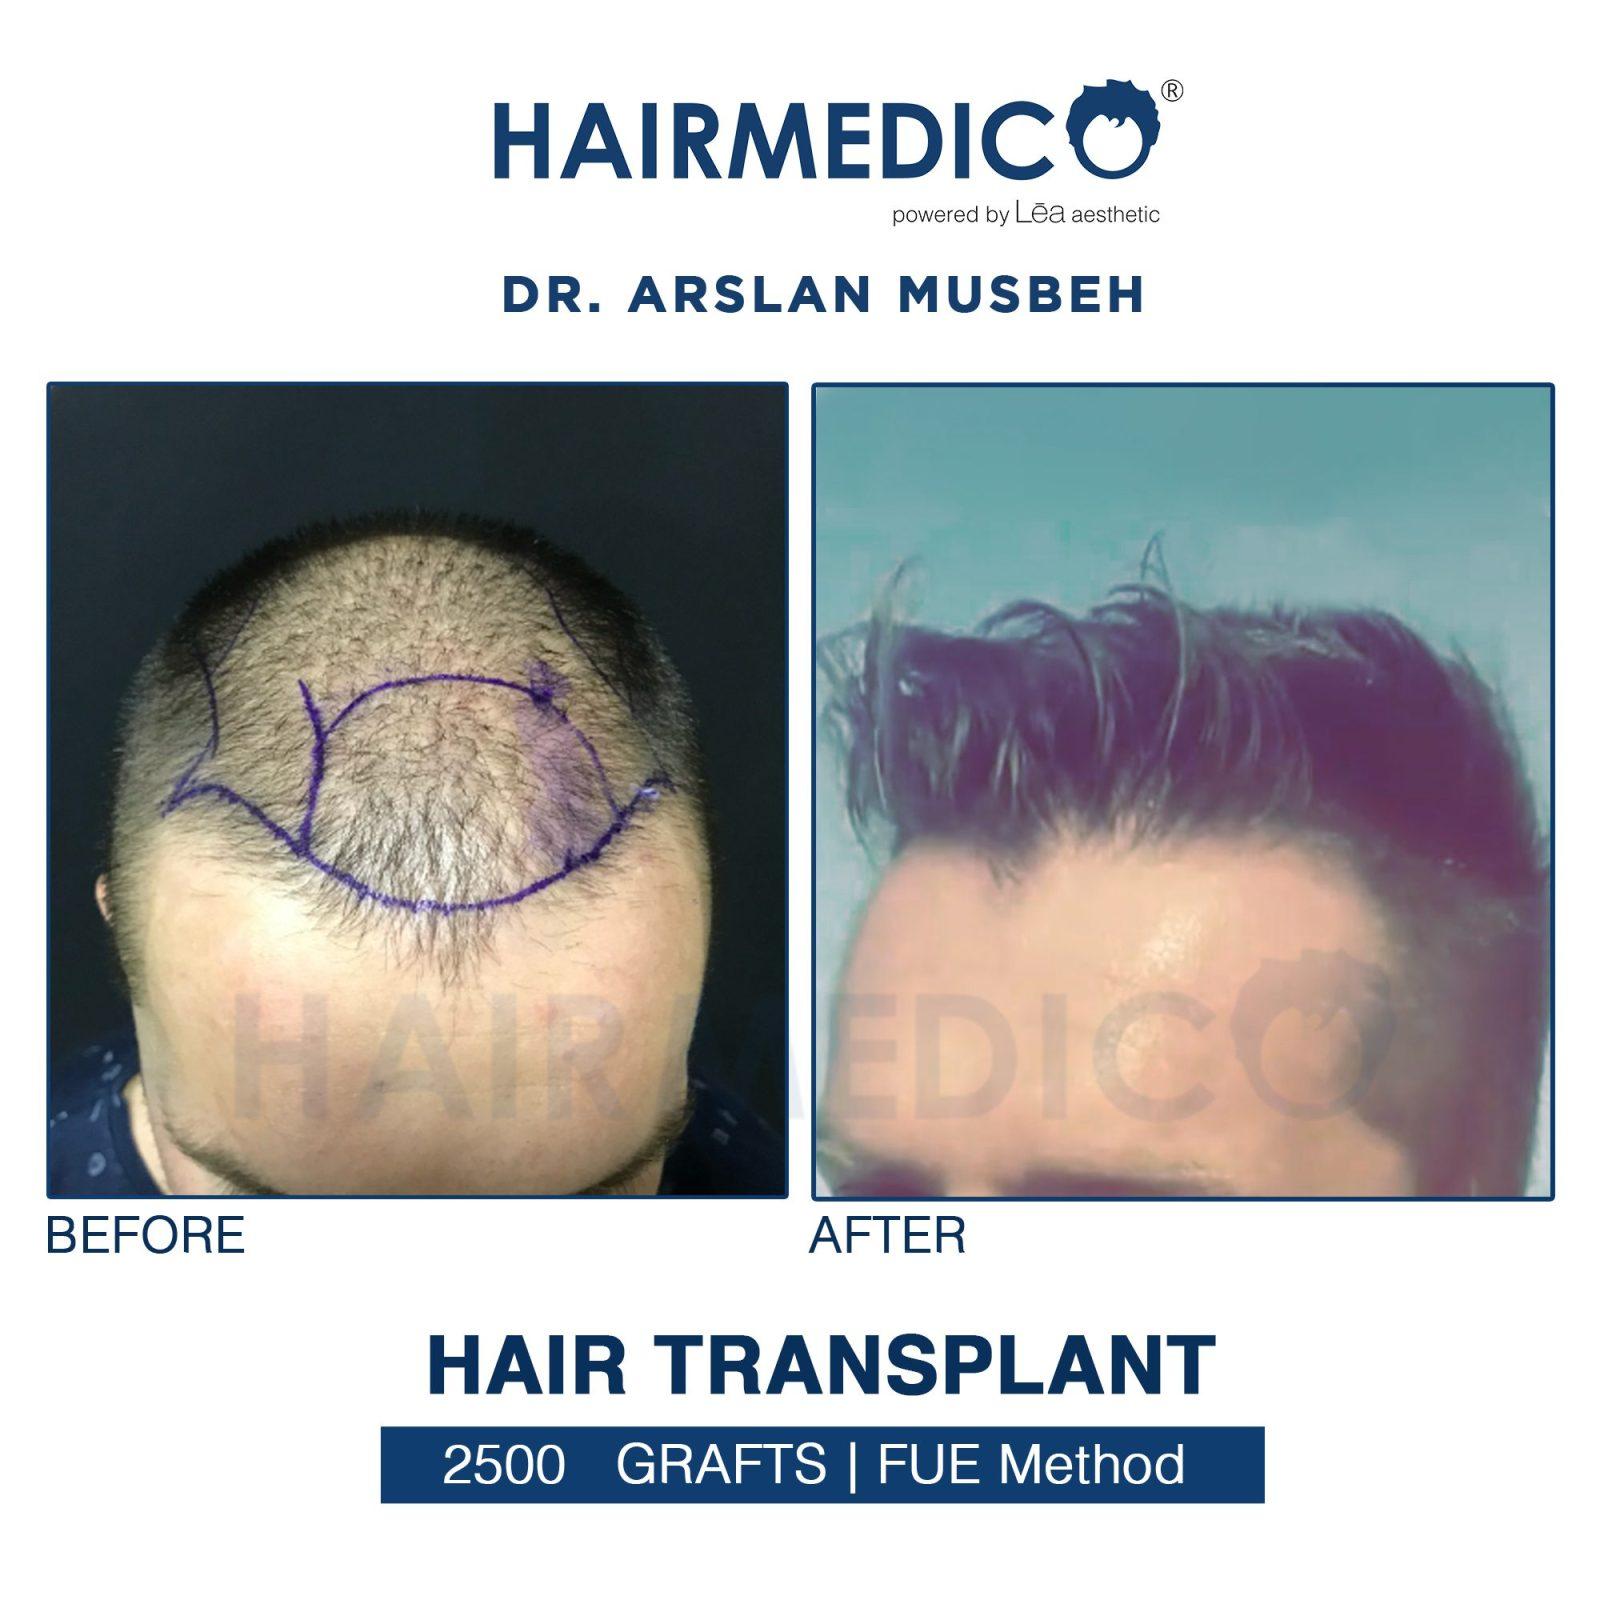 Hair Transplant in Turkey